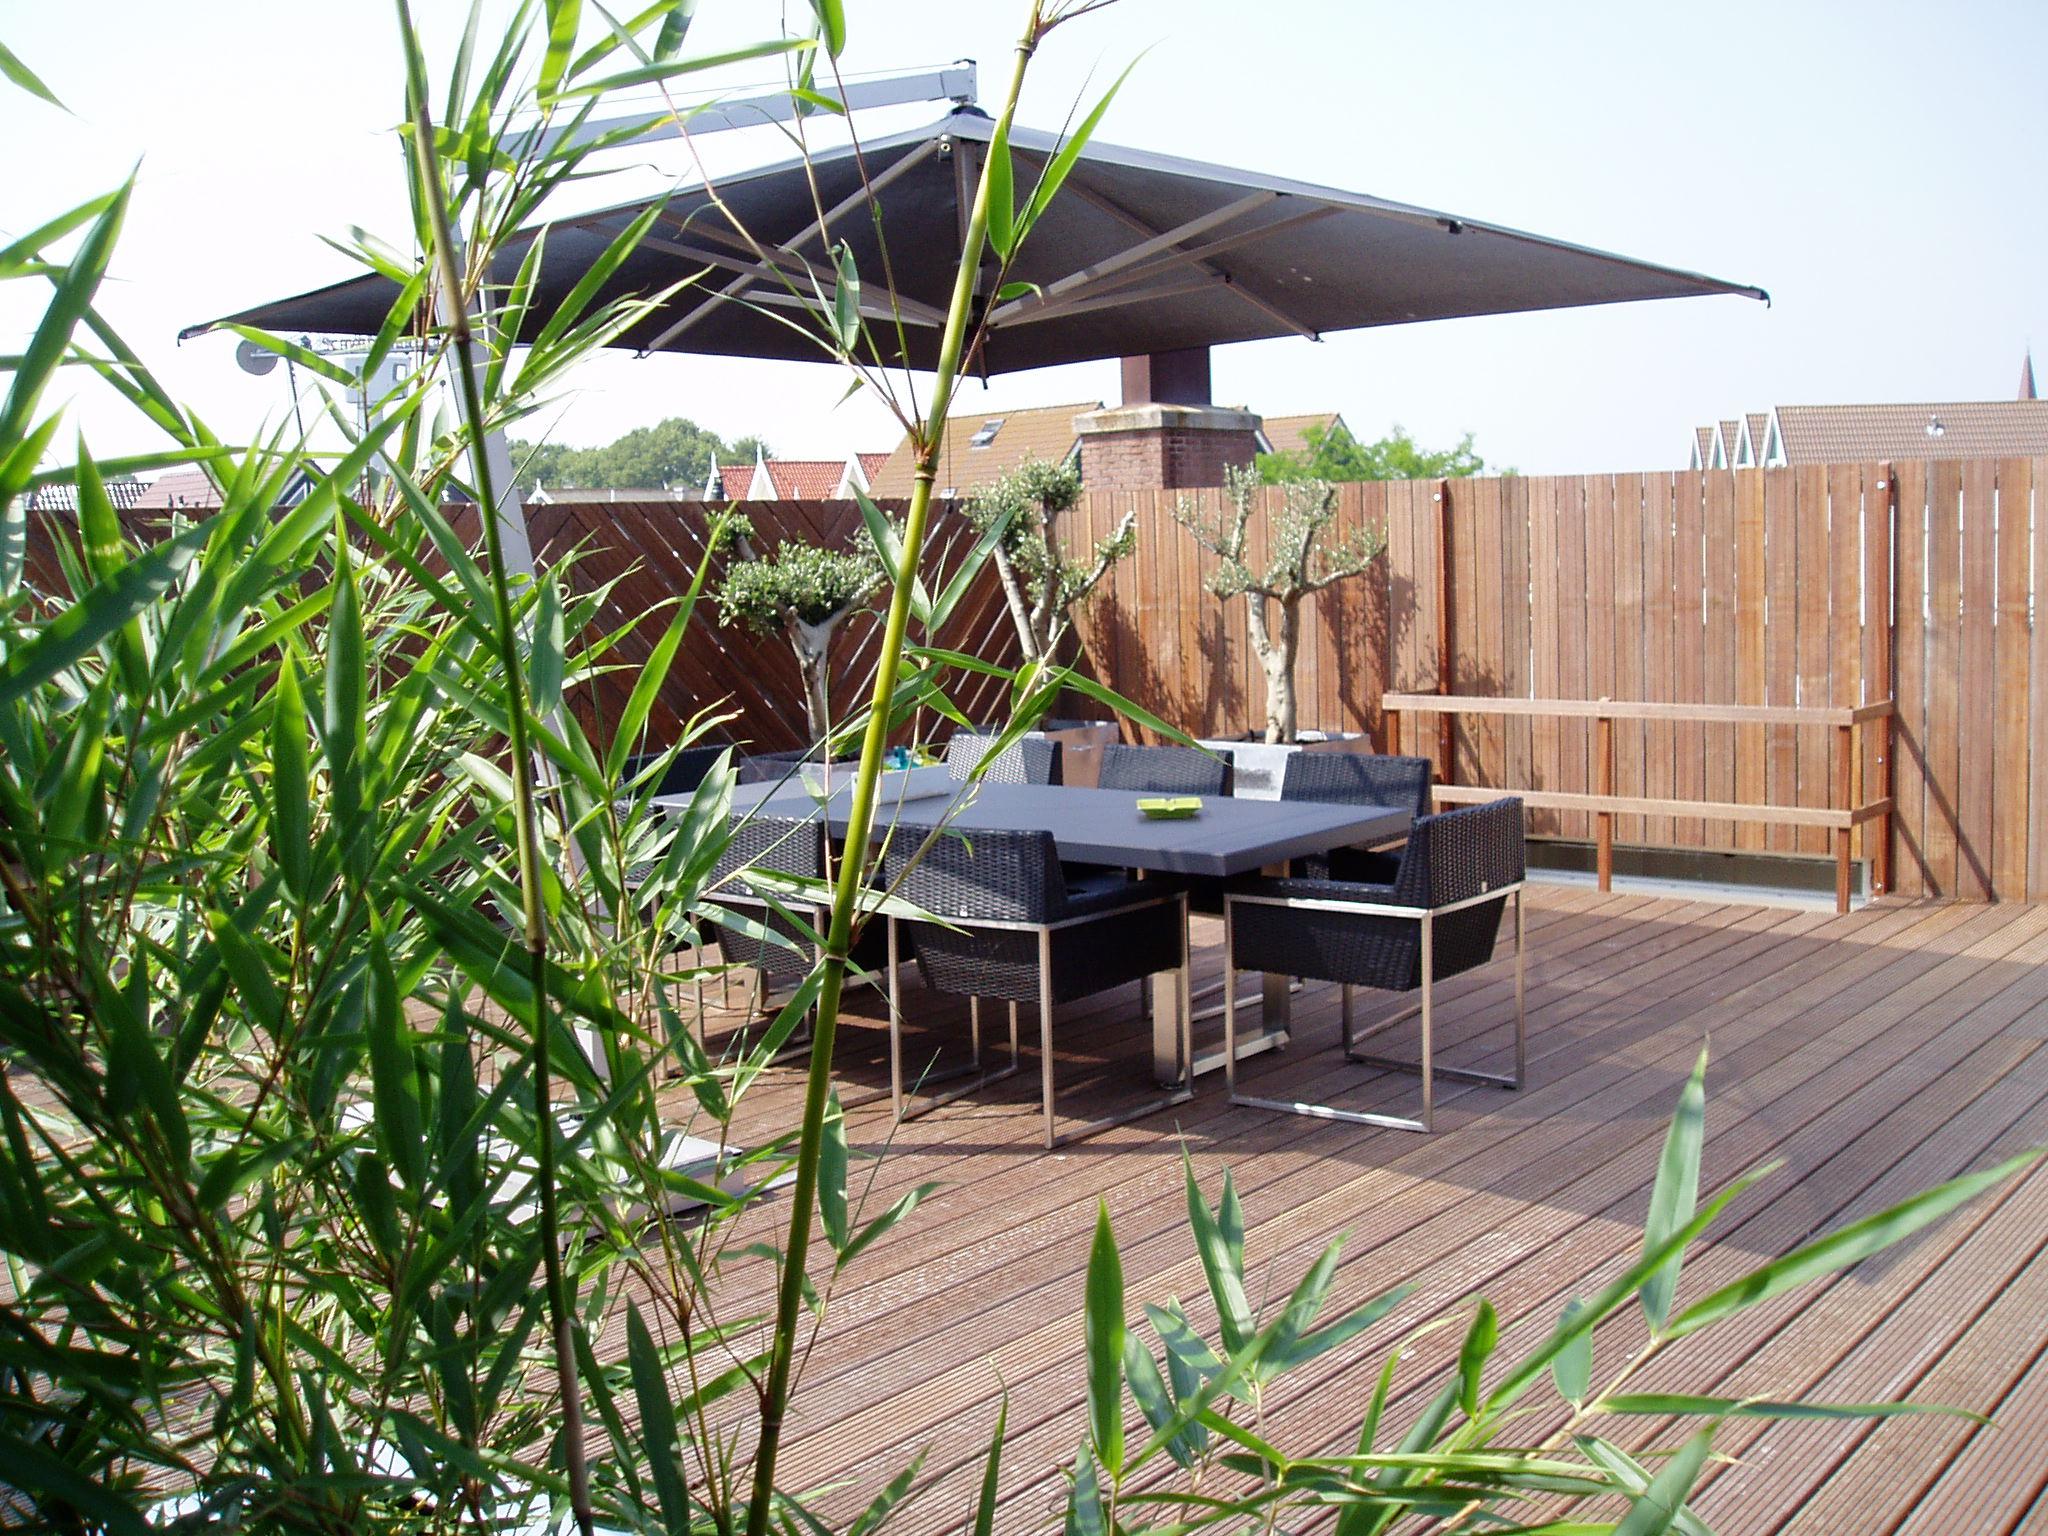 Rieten Balkon Meubels : Balkontuin. best plantenbak bloembak verticale tuin balkontuin with